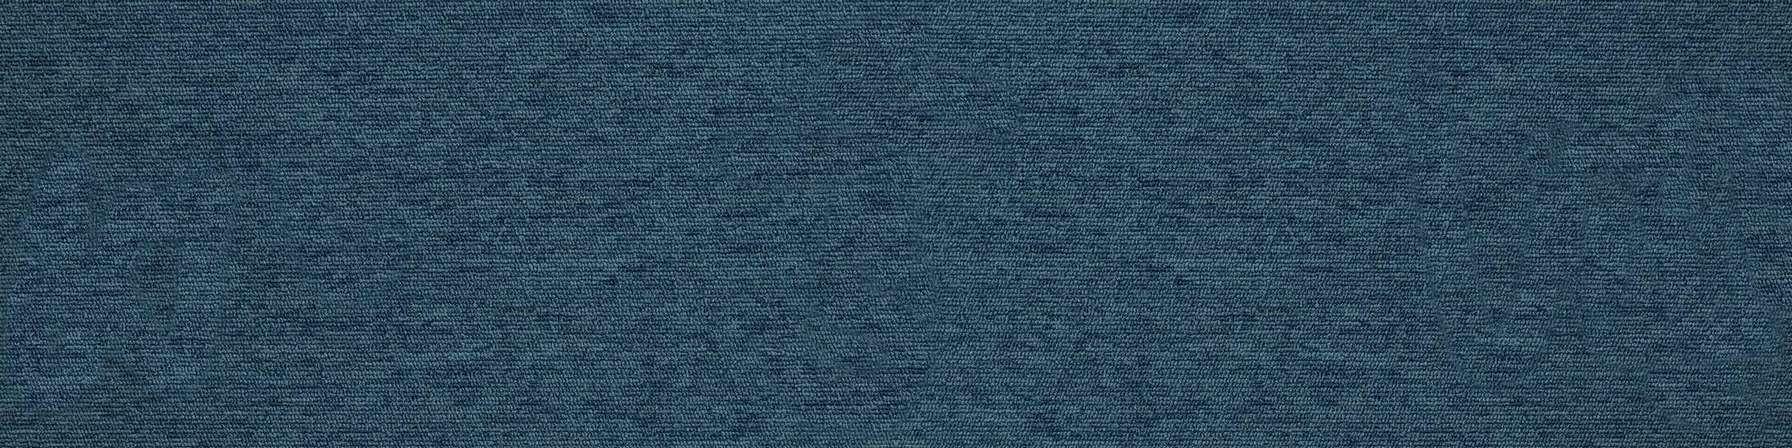 tivoli 21152 nassau skies carpet plank